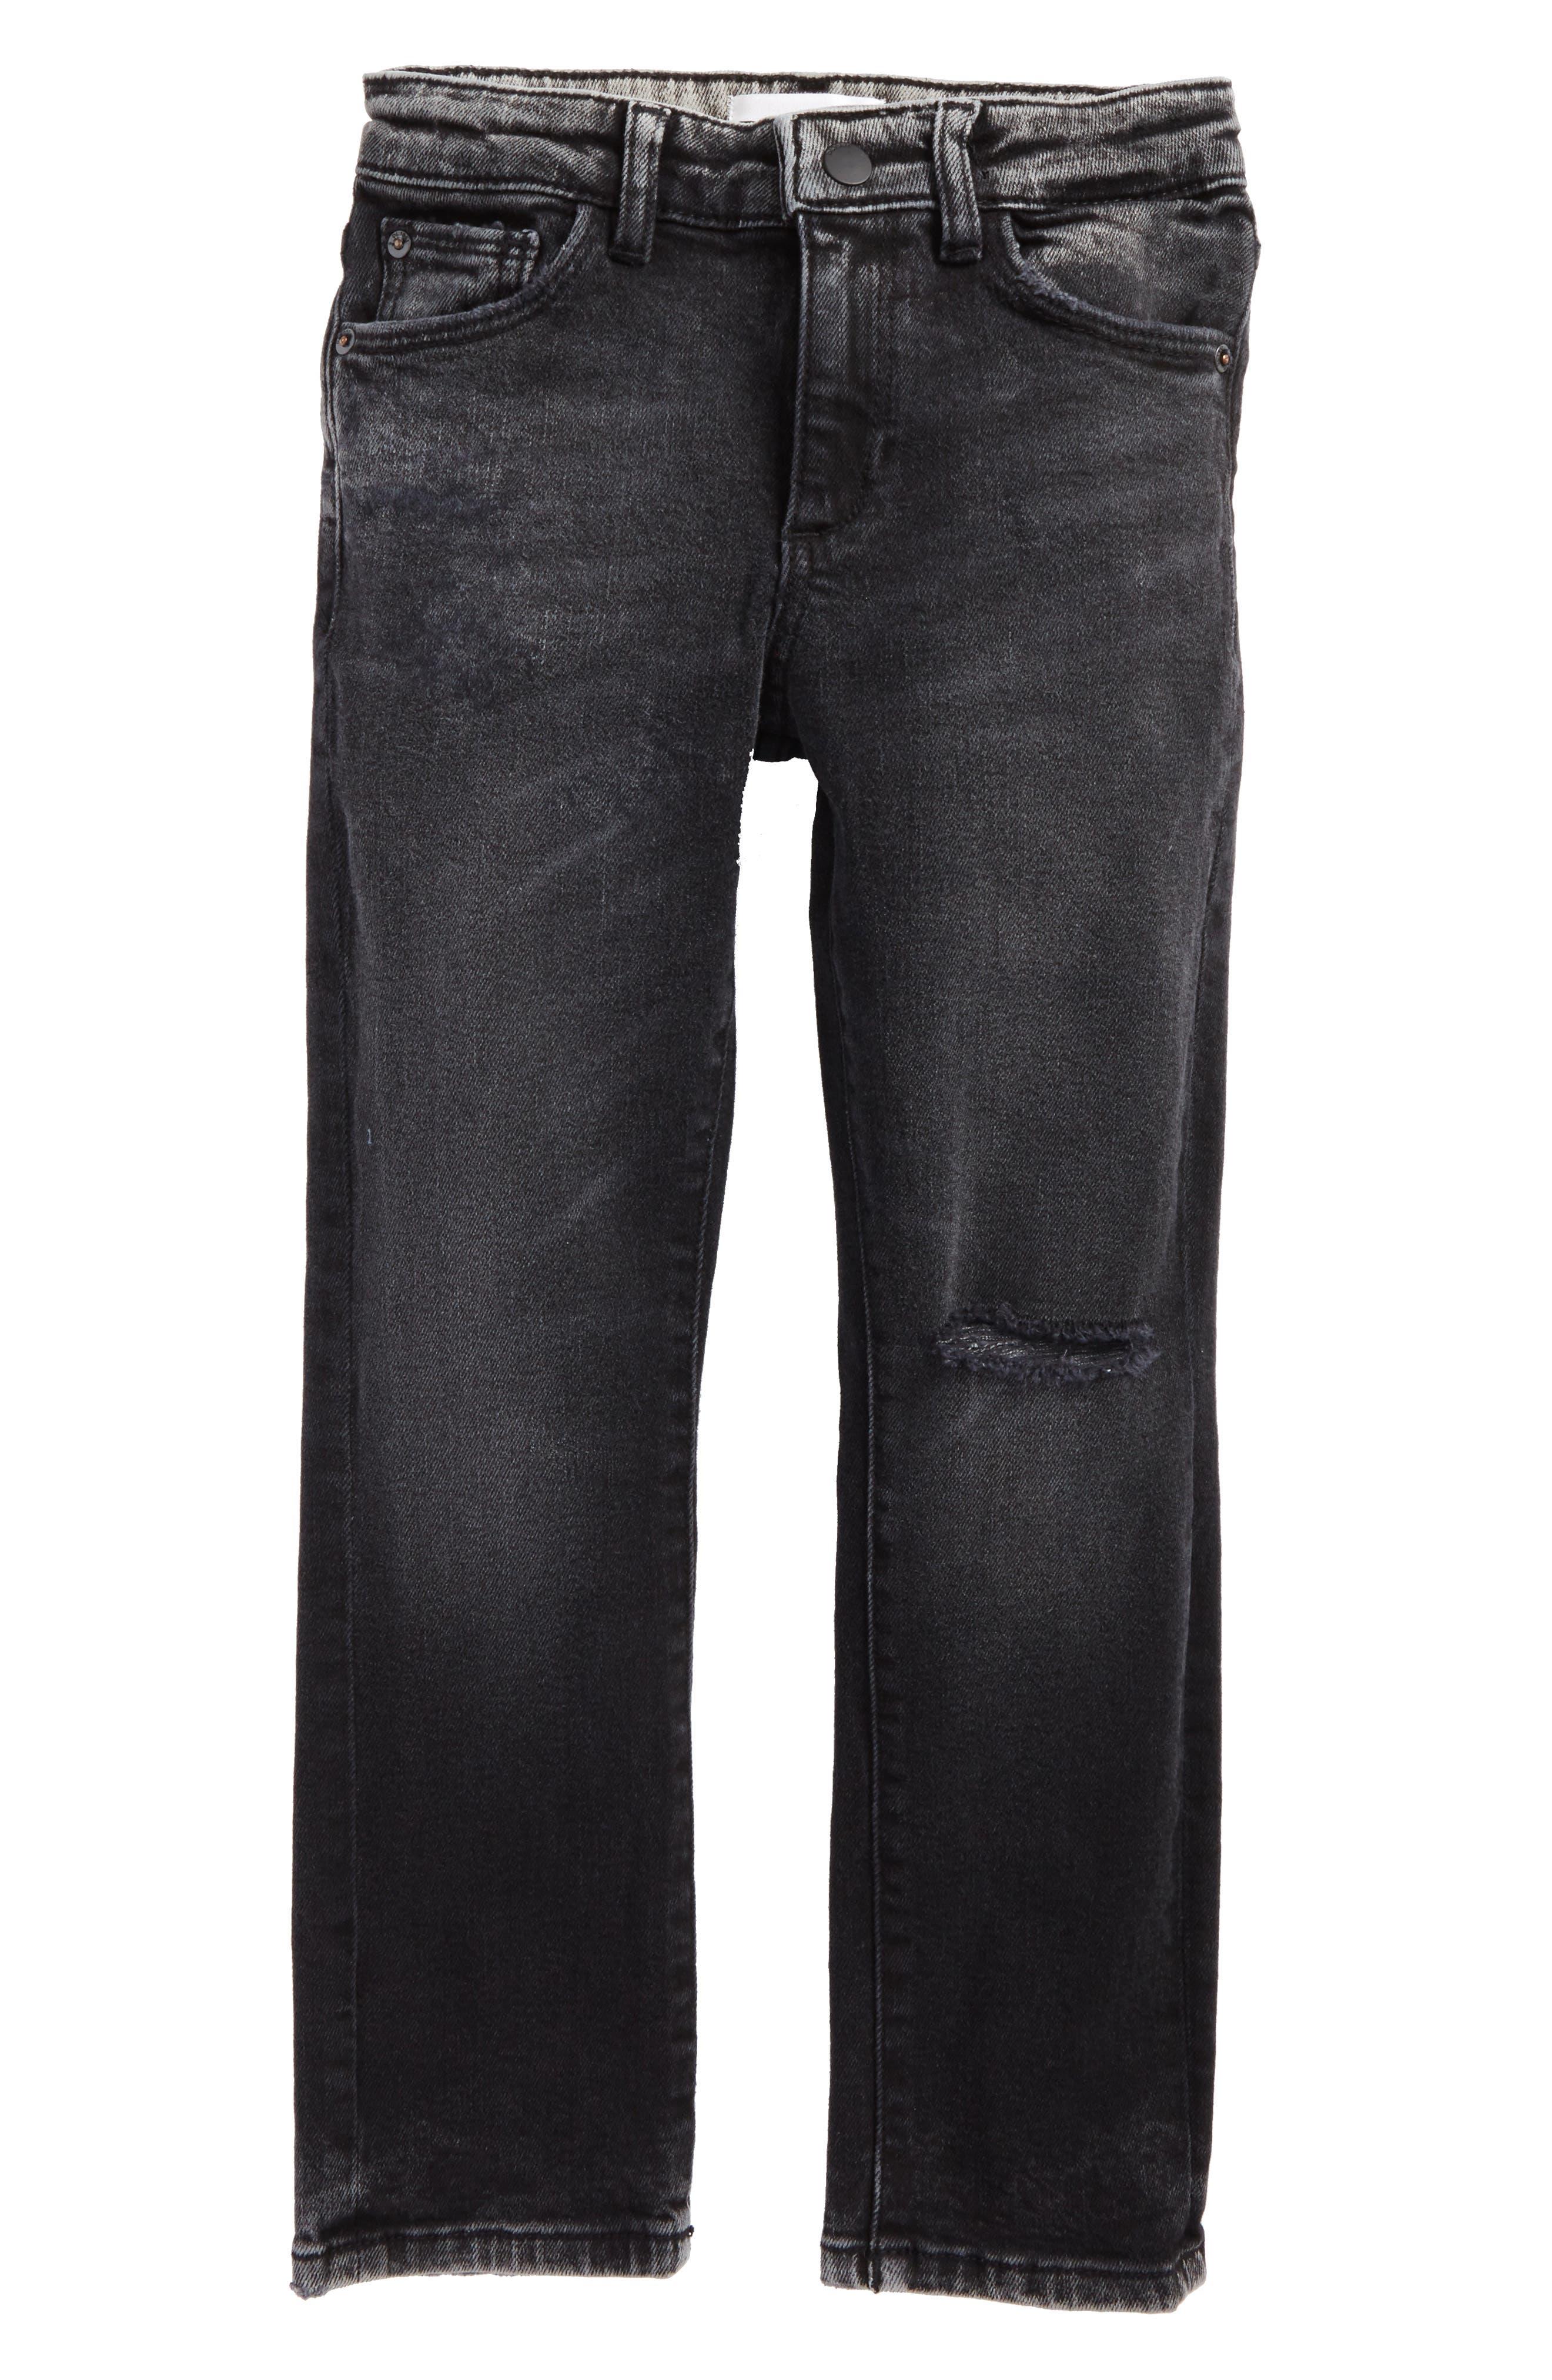 Hawke Skinny Jeans,                             Main thumbnail 1, color,